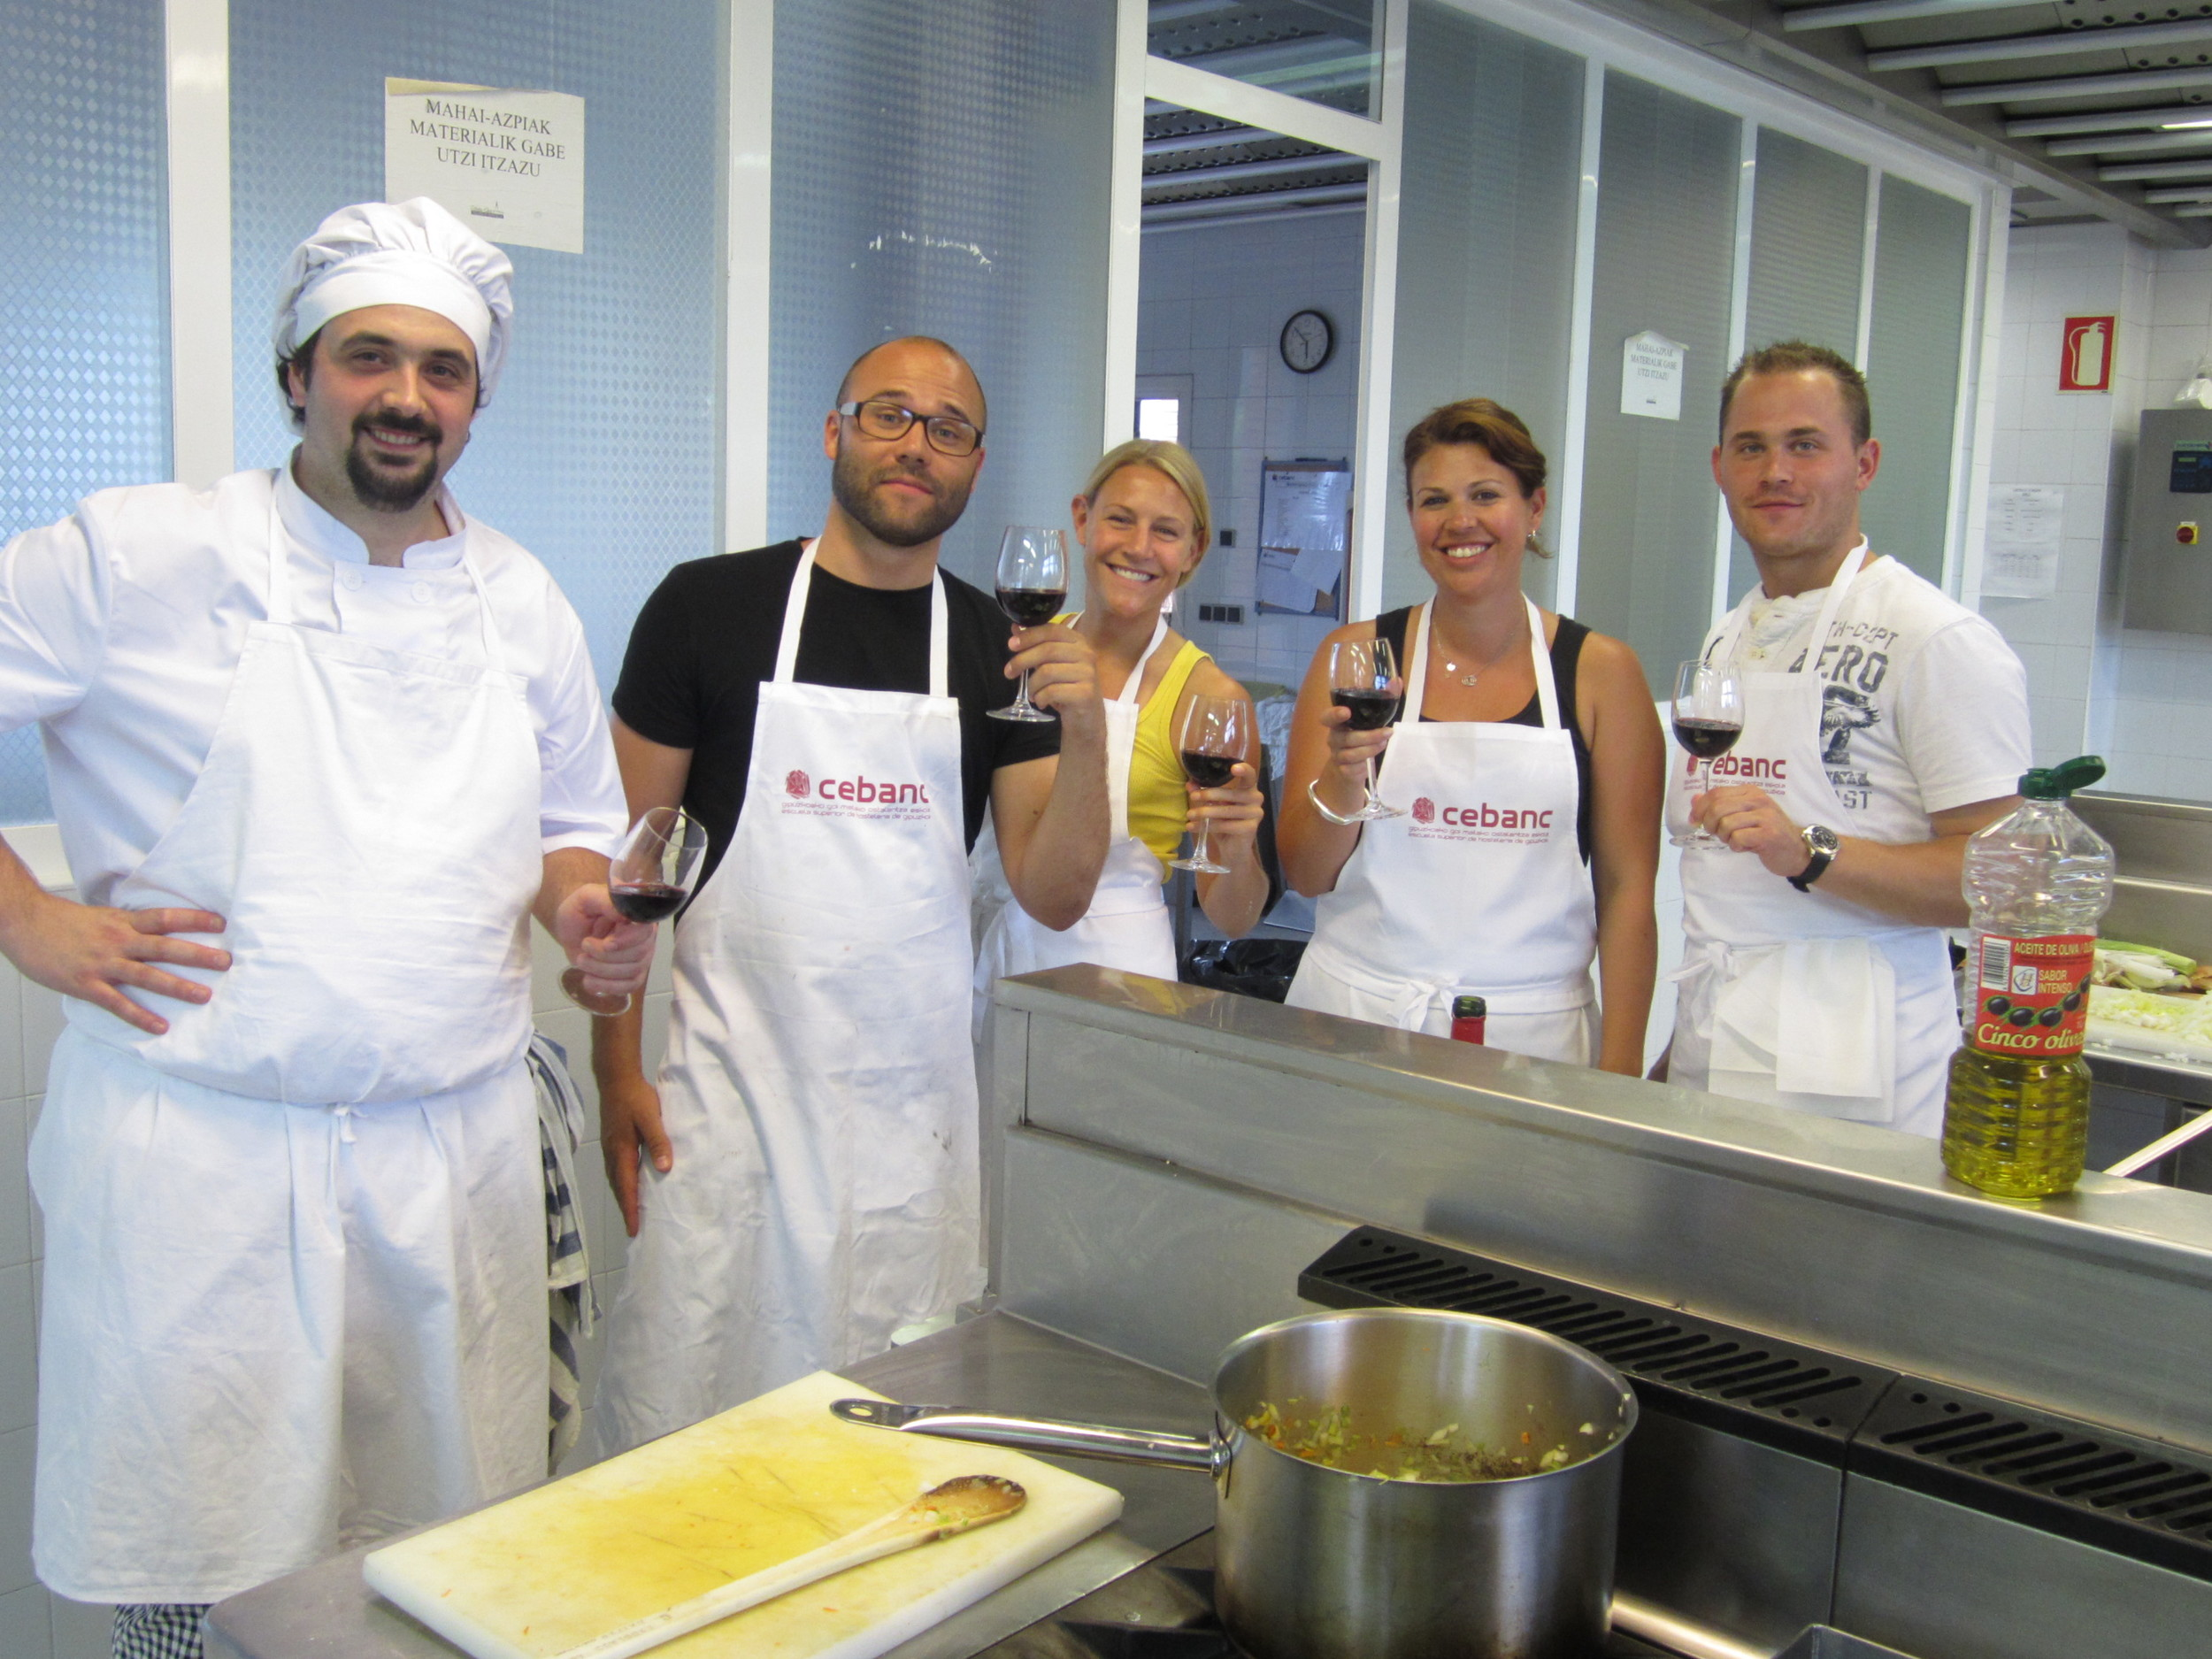 cooking class with Igor at Cebanc in San Sebastian